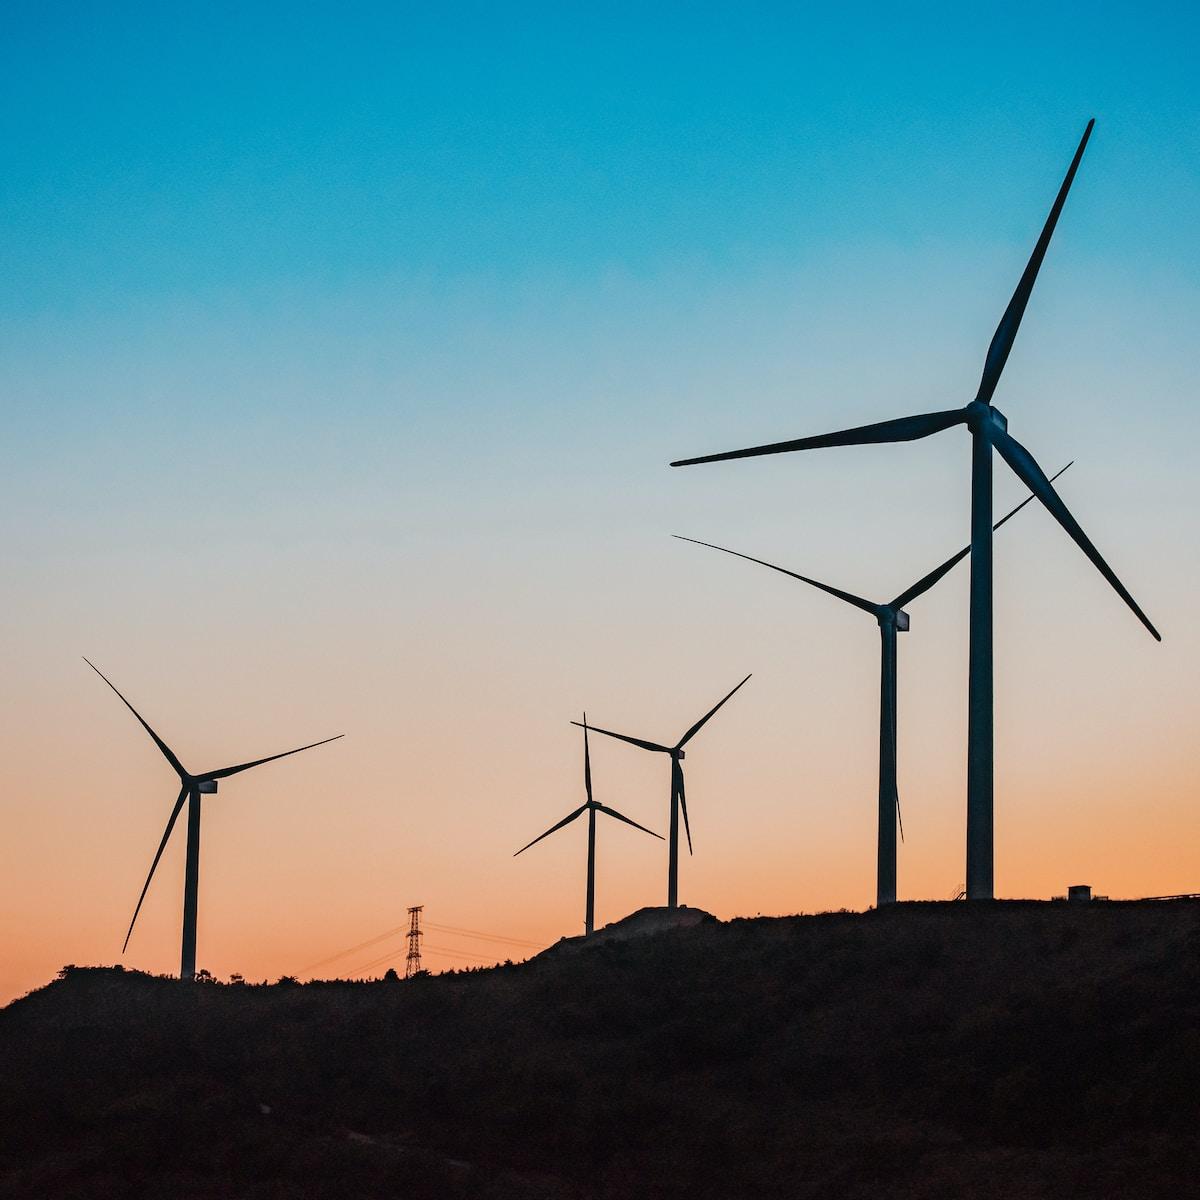 Turbinas de viento / Precio de la luz